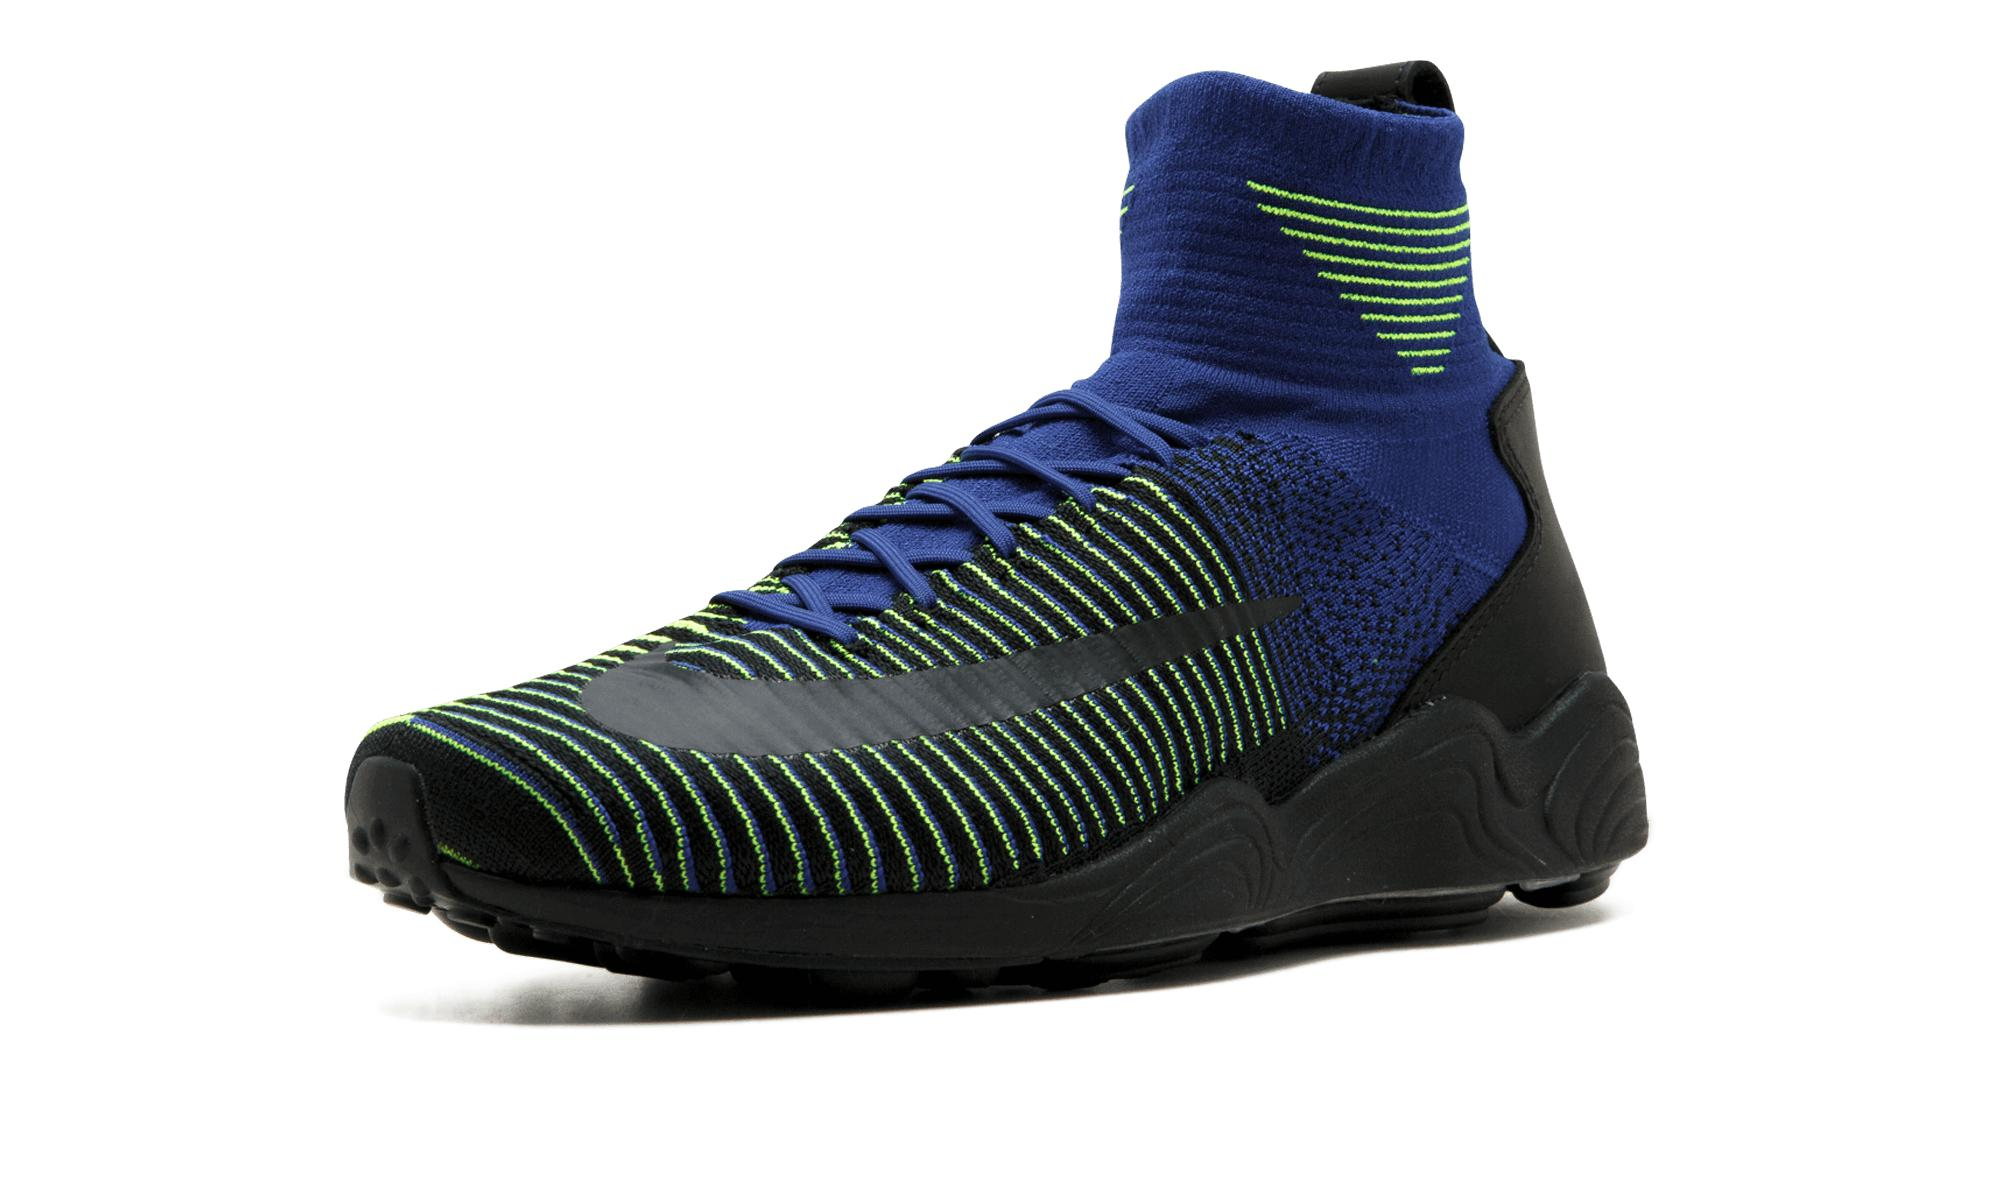 b800c5baa0a8 Nike Zoom Mercurial Xi Fk for Men - Save 8% - Lyst